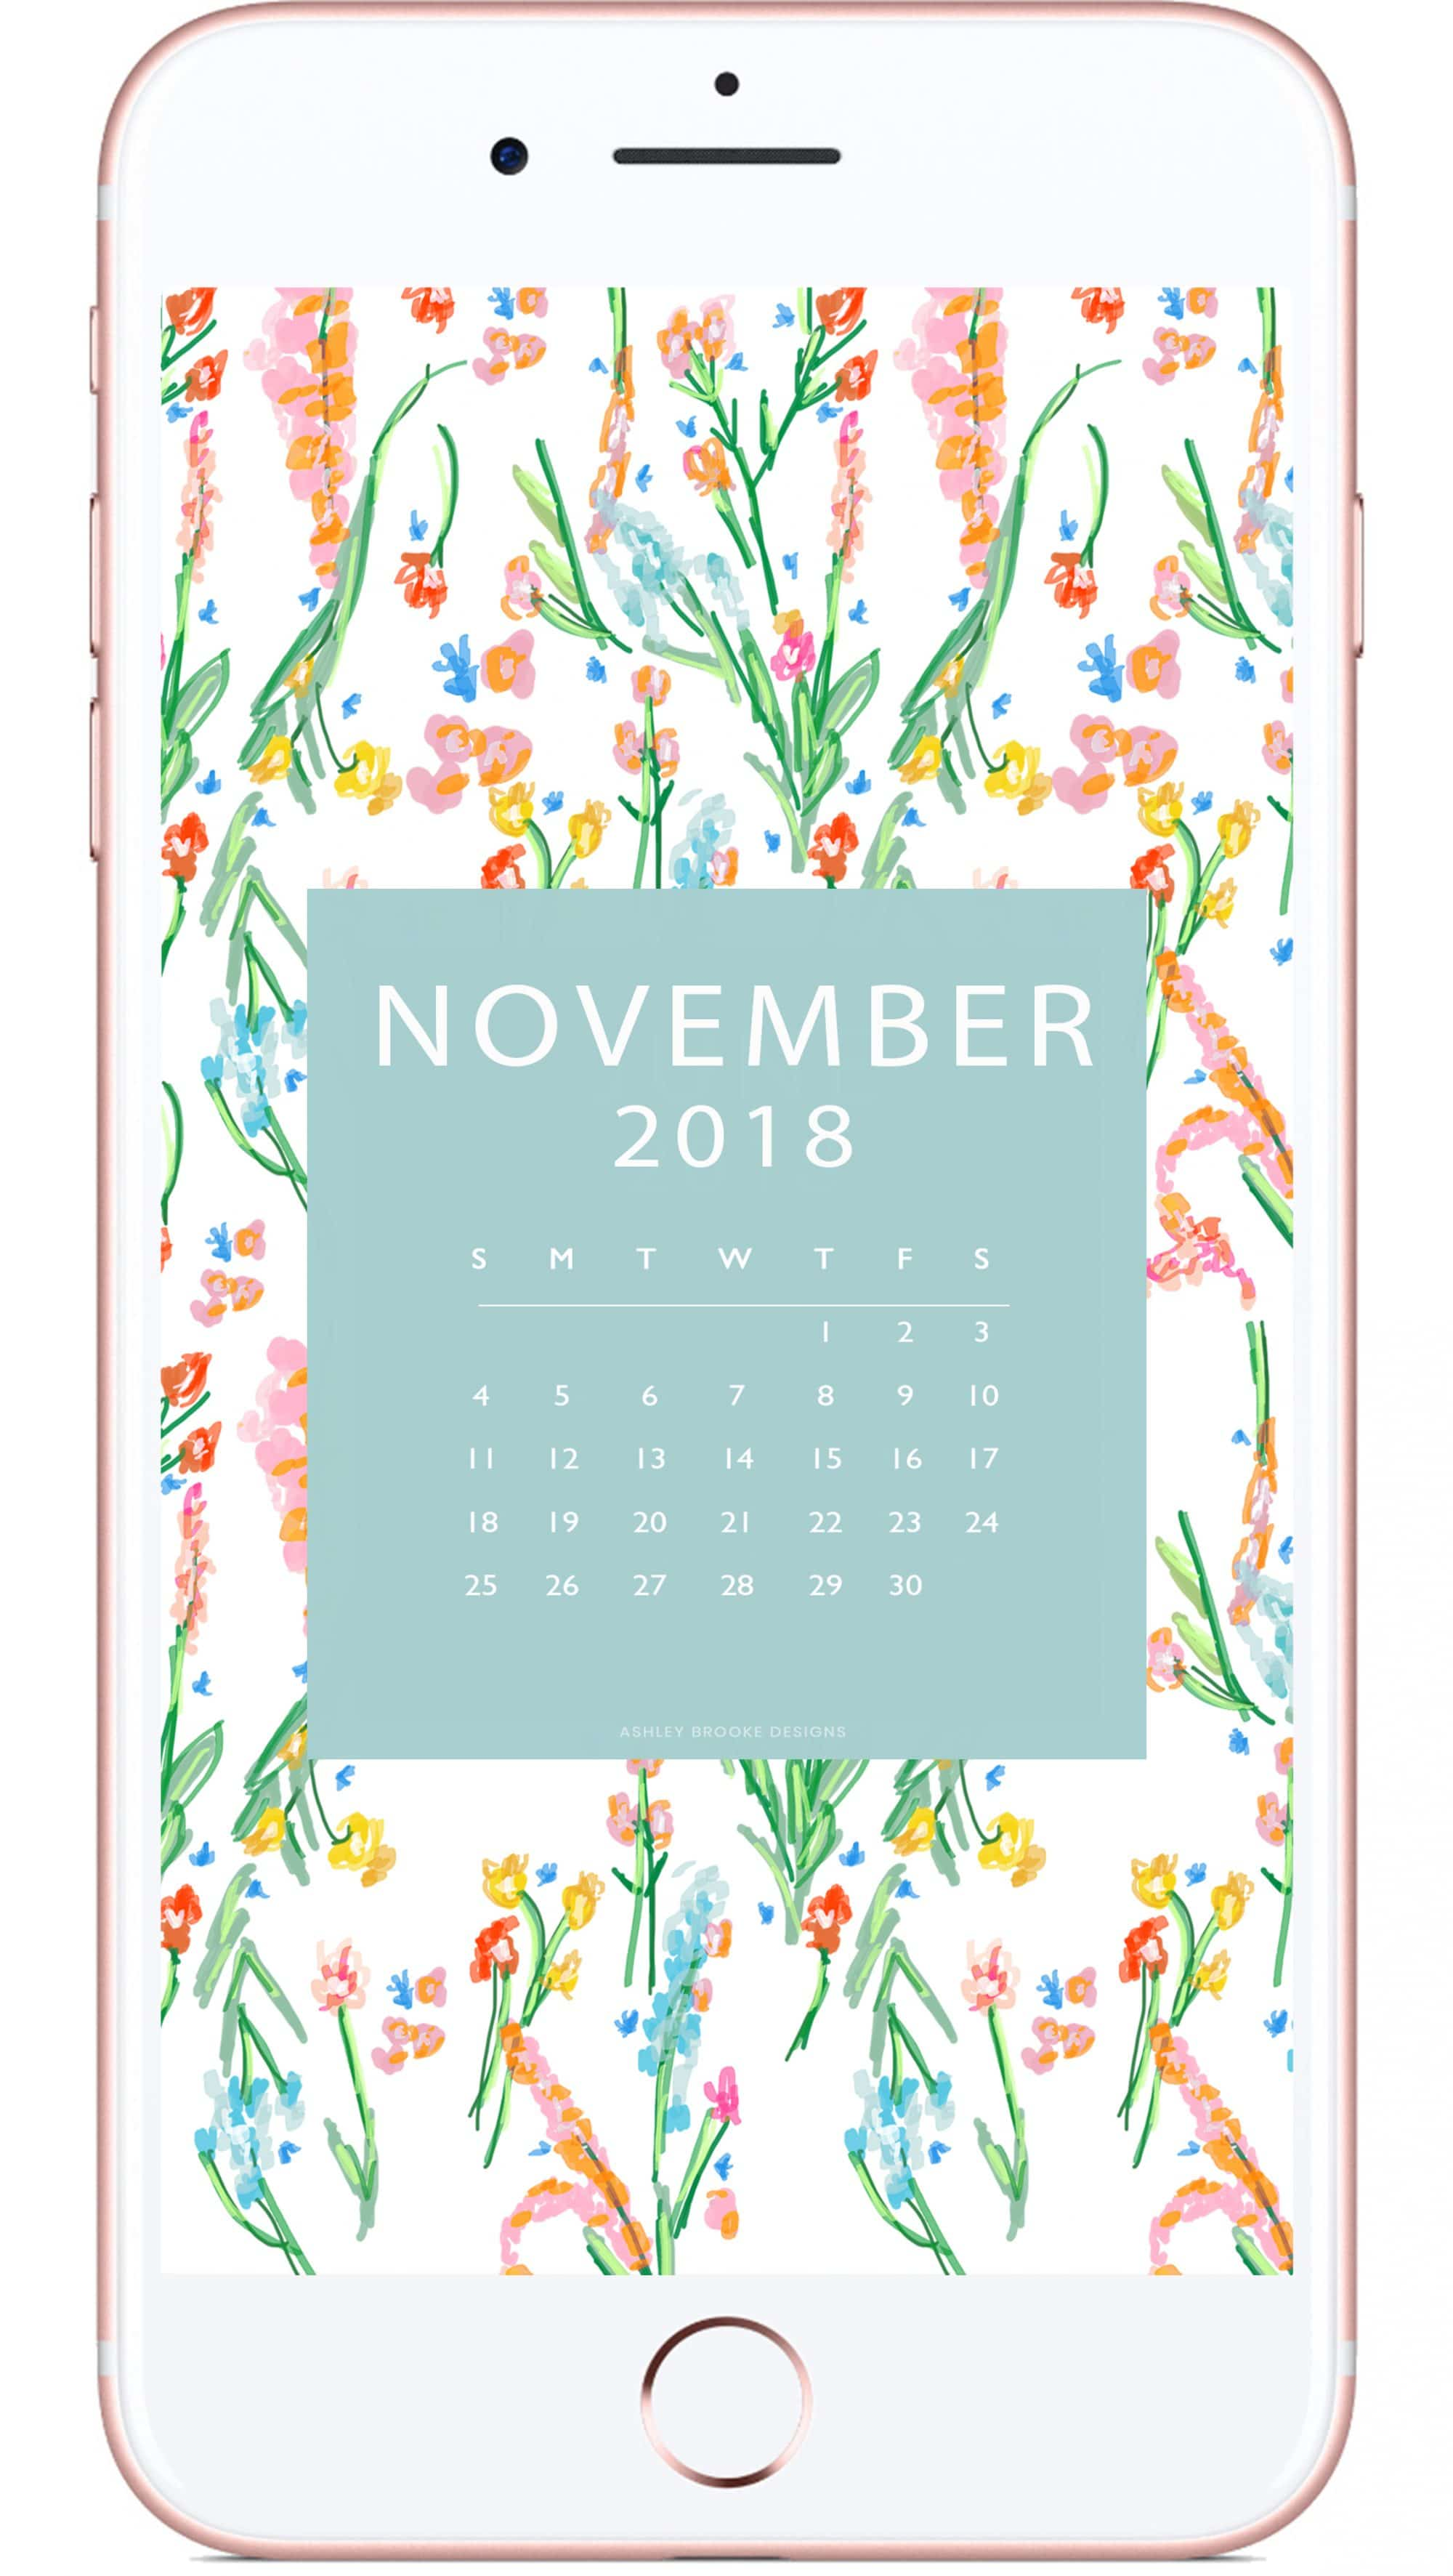 Ashley Brooke - iphone- November Download - phone